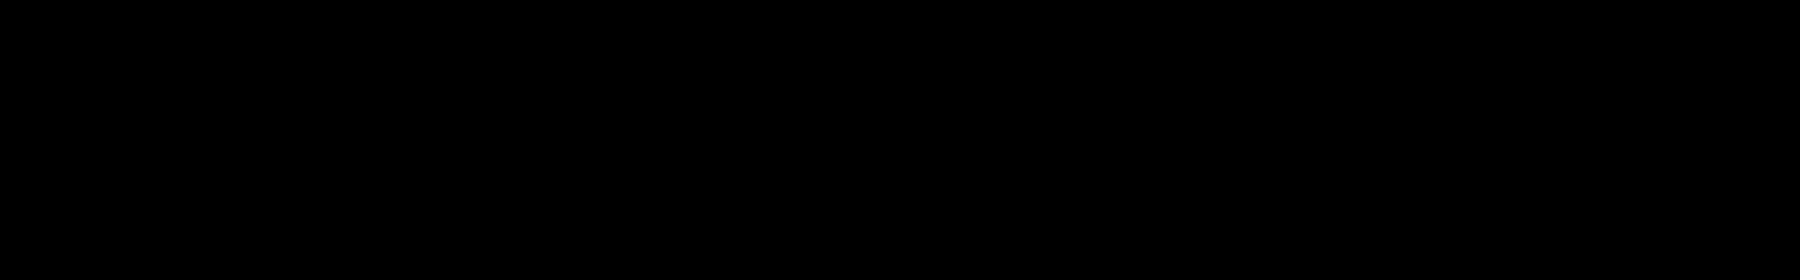 Blxst audio waveform